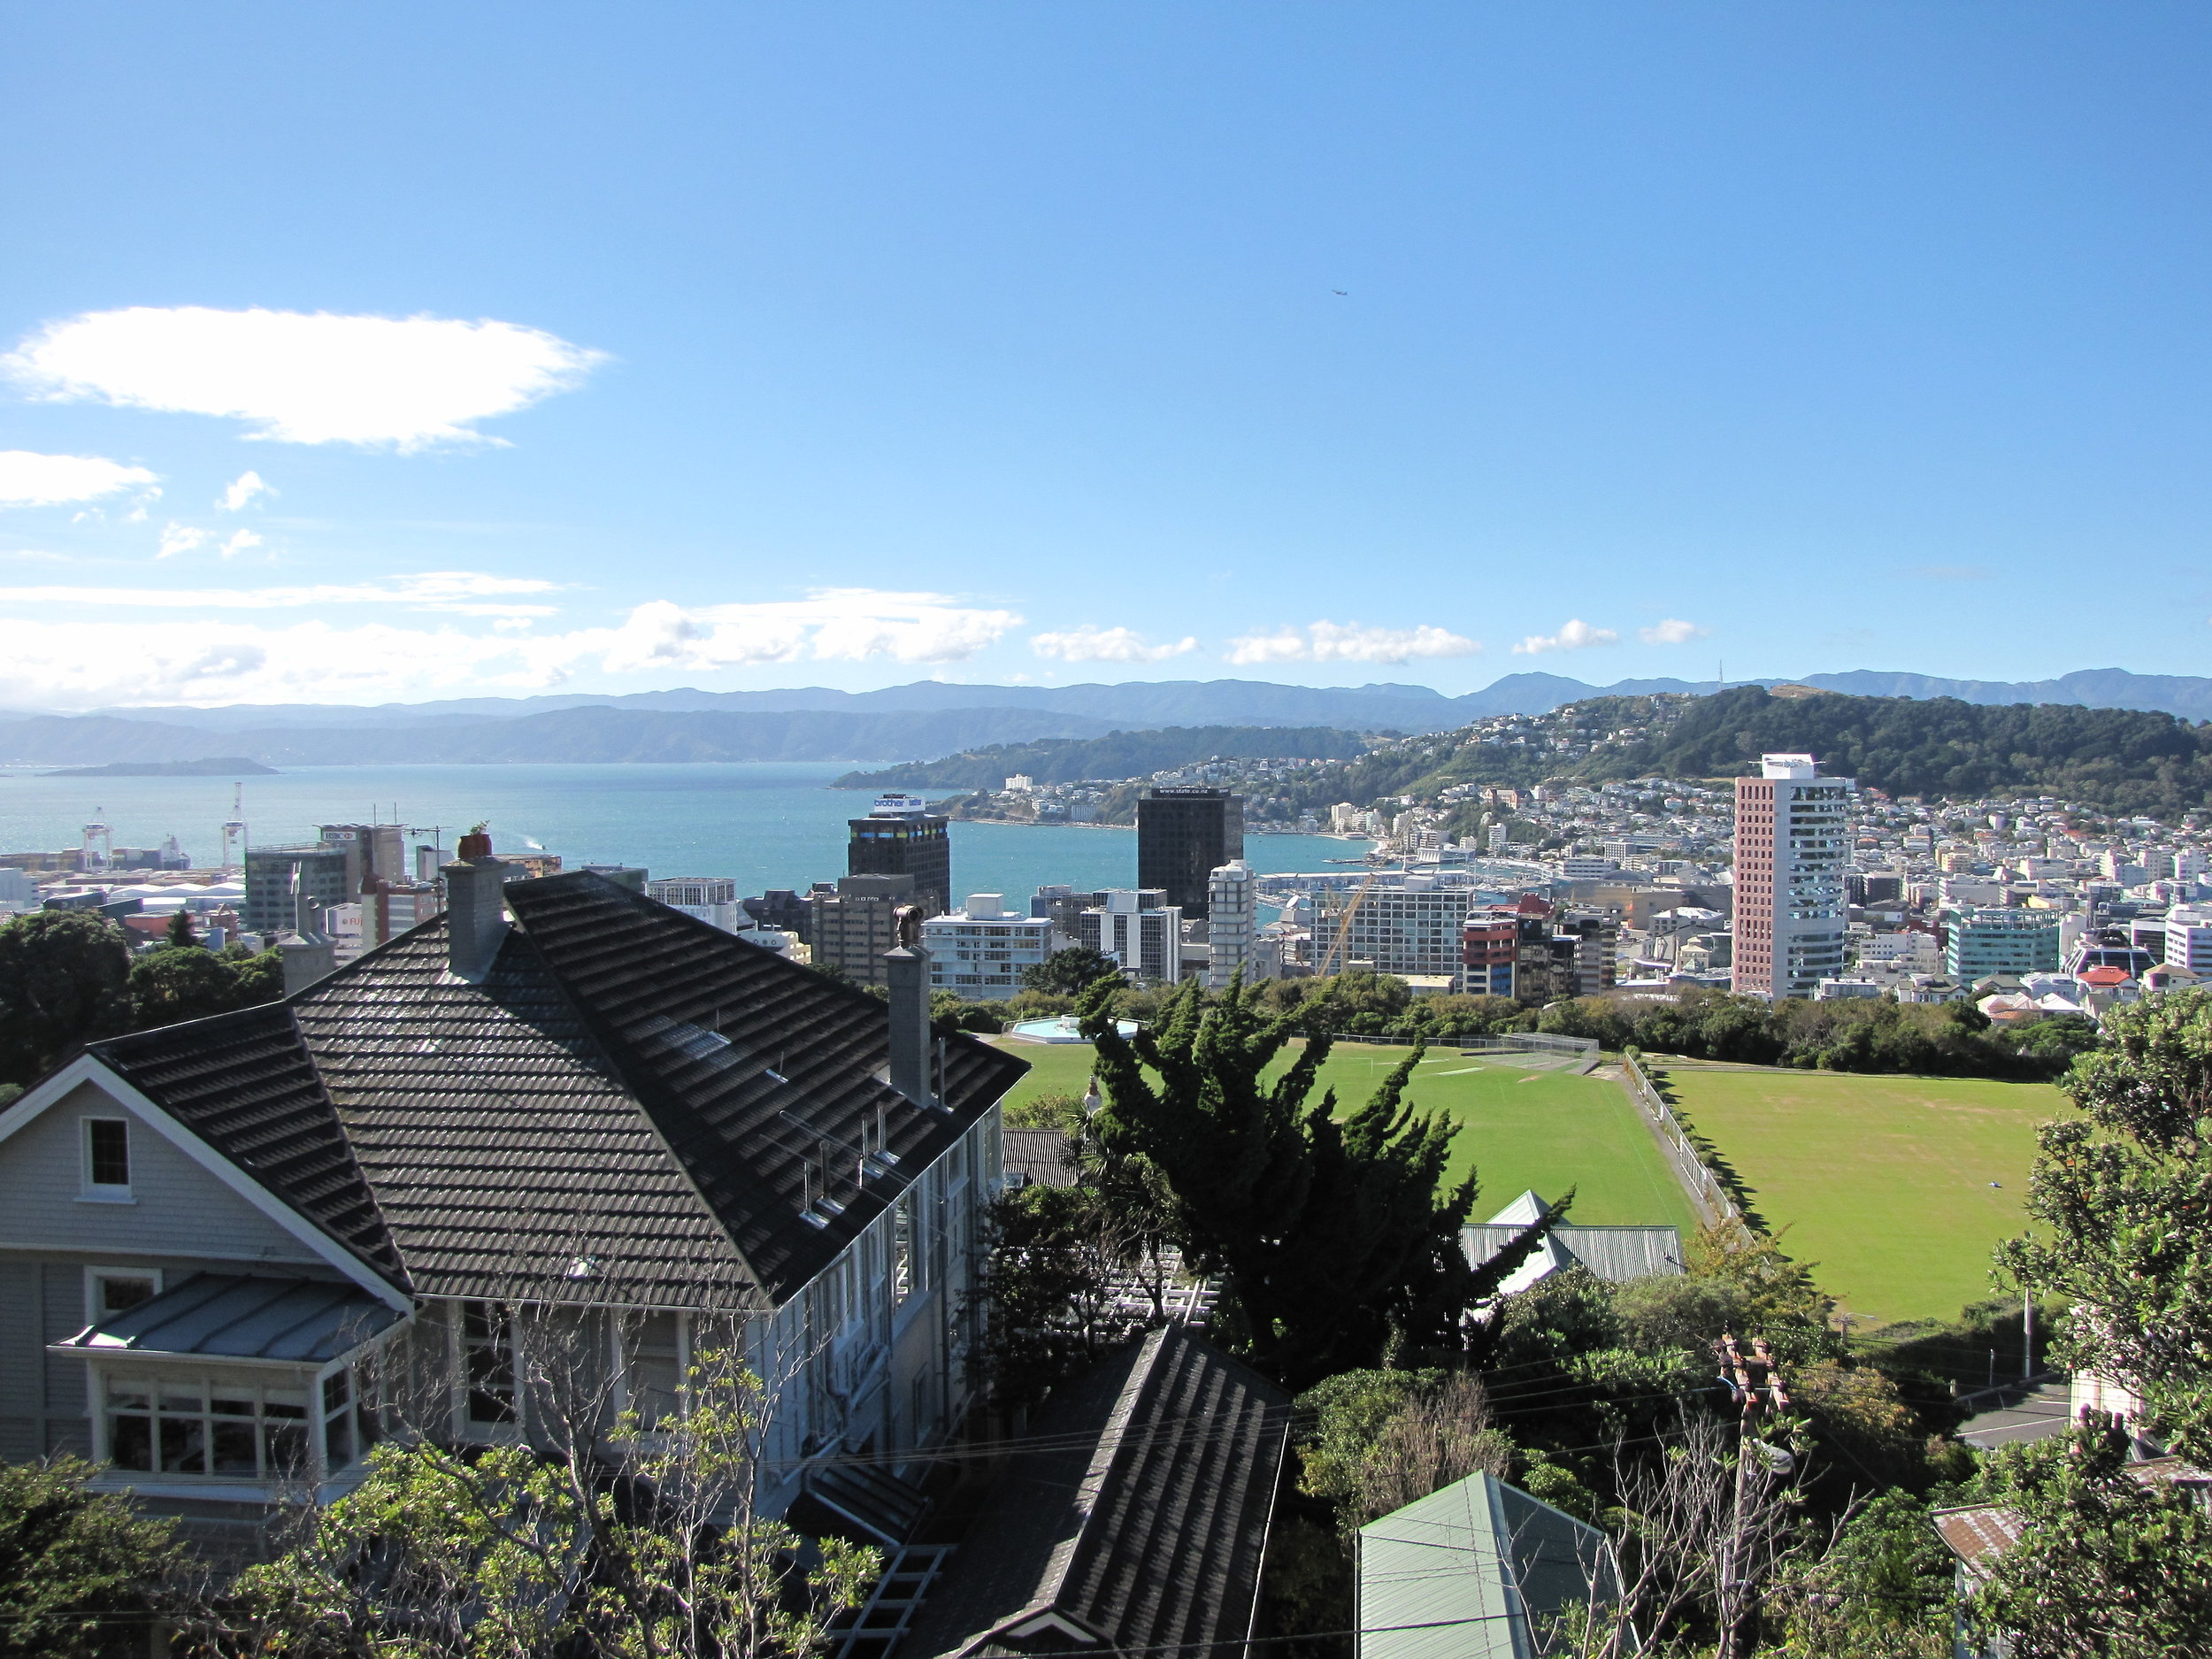 City view of windy Wellington